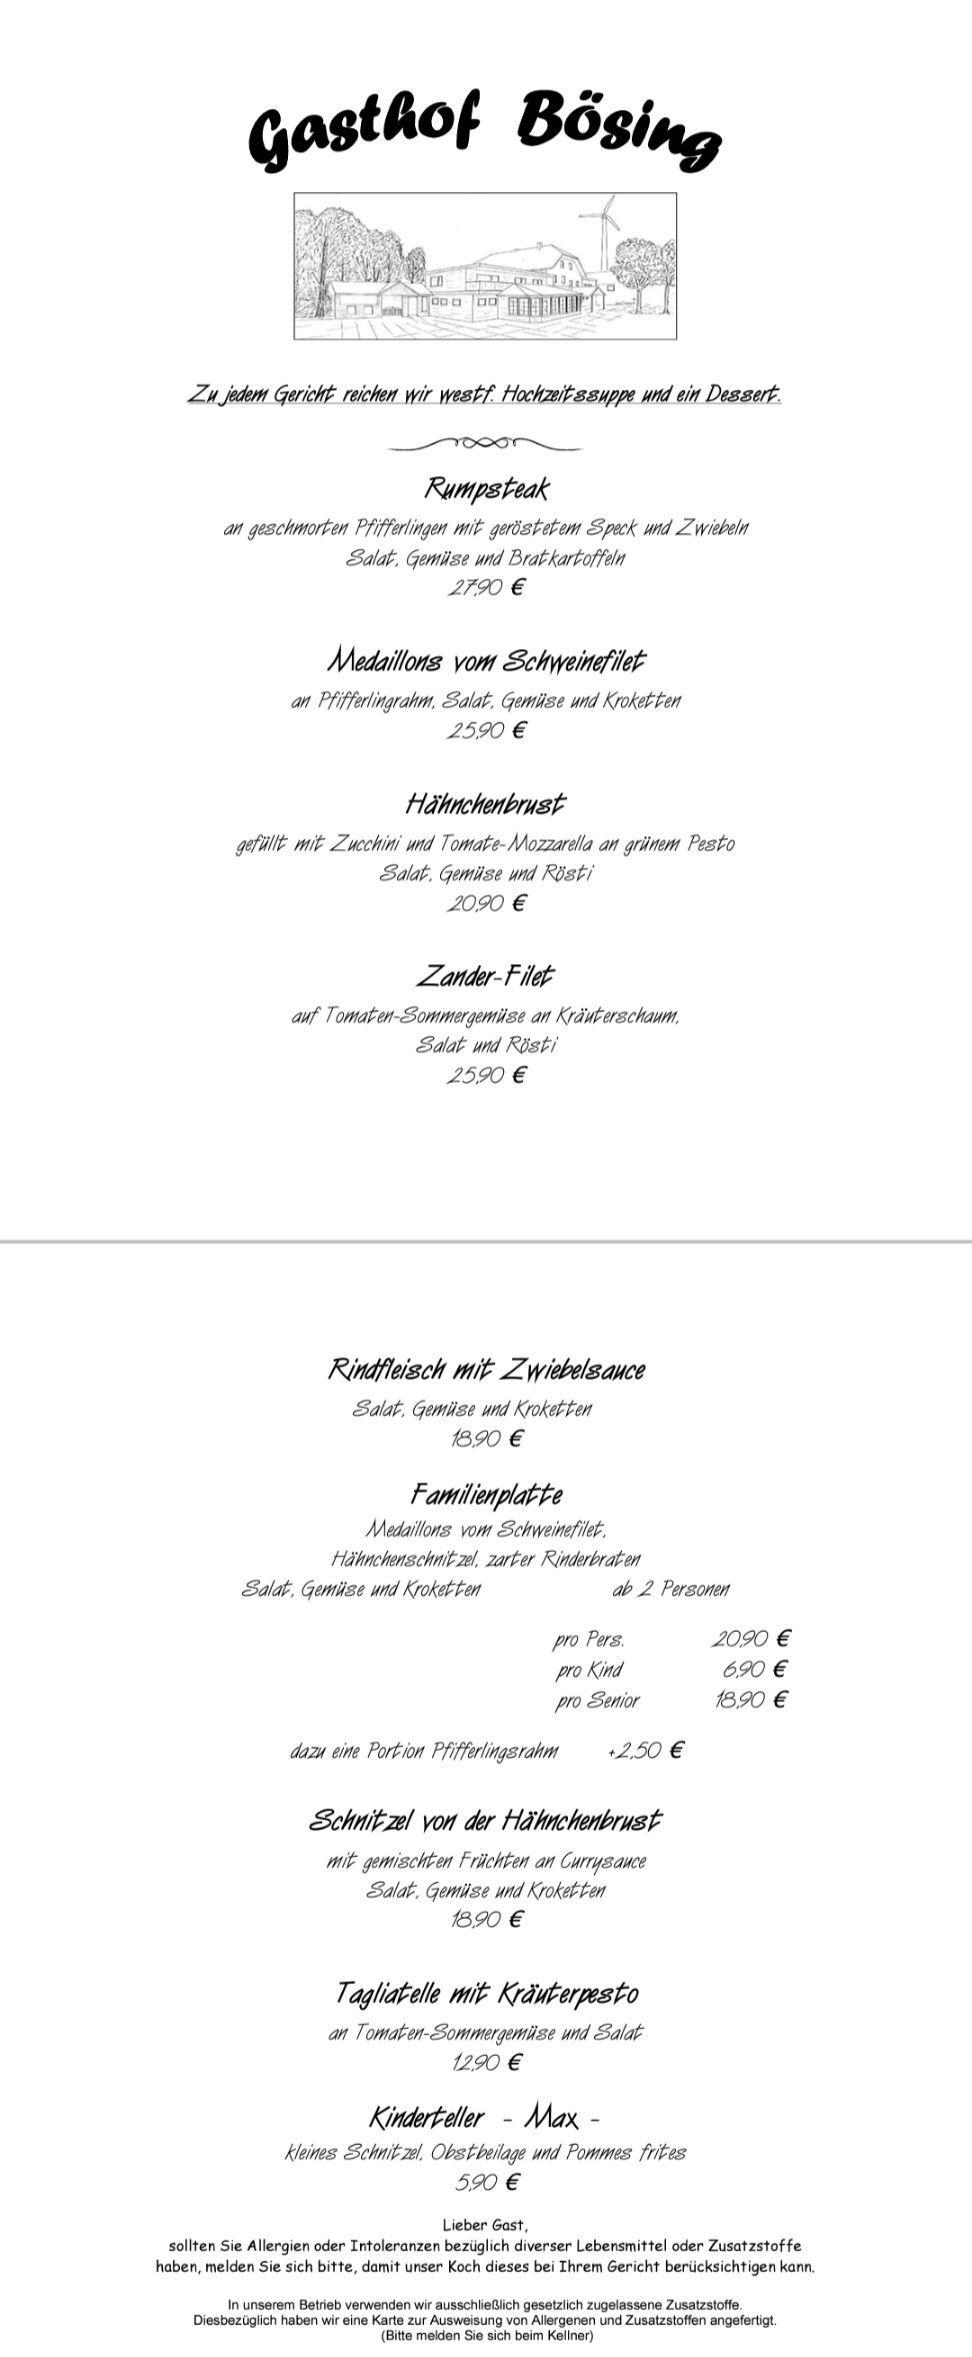 Speisekarten | Gasthof Bösing